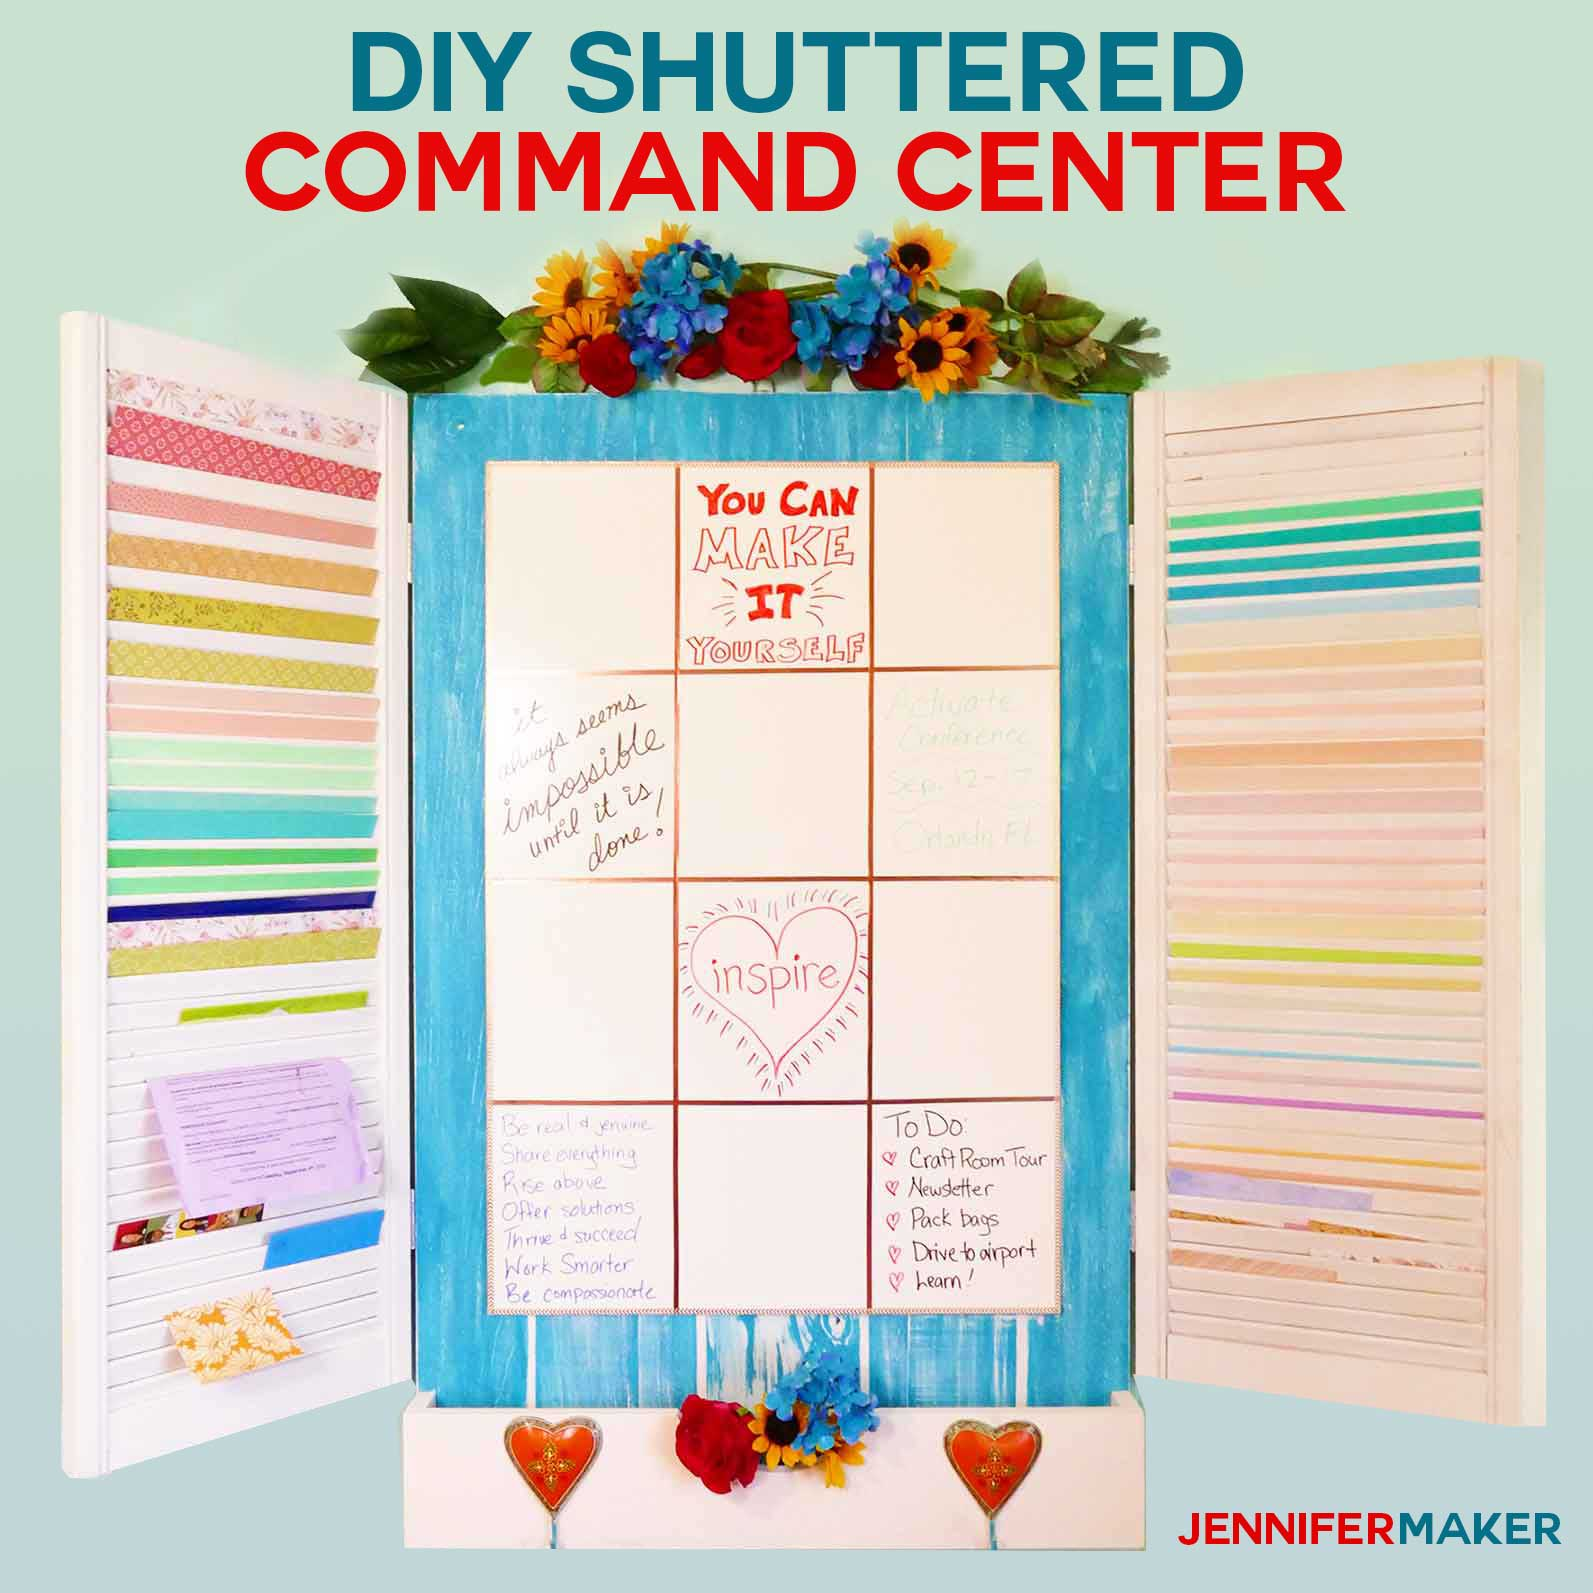 DIY Command Center with Paper Storage - Jennifer Maker